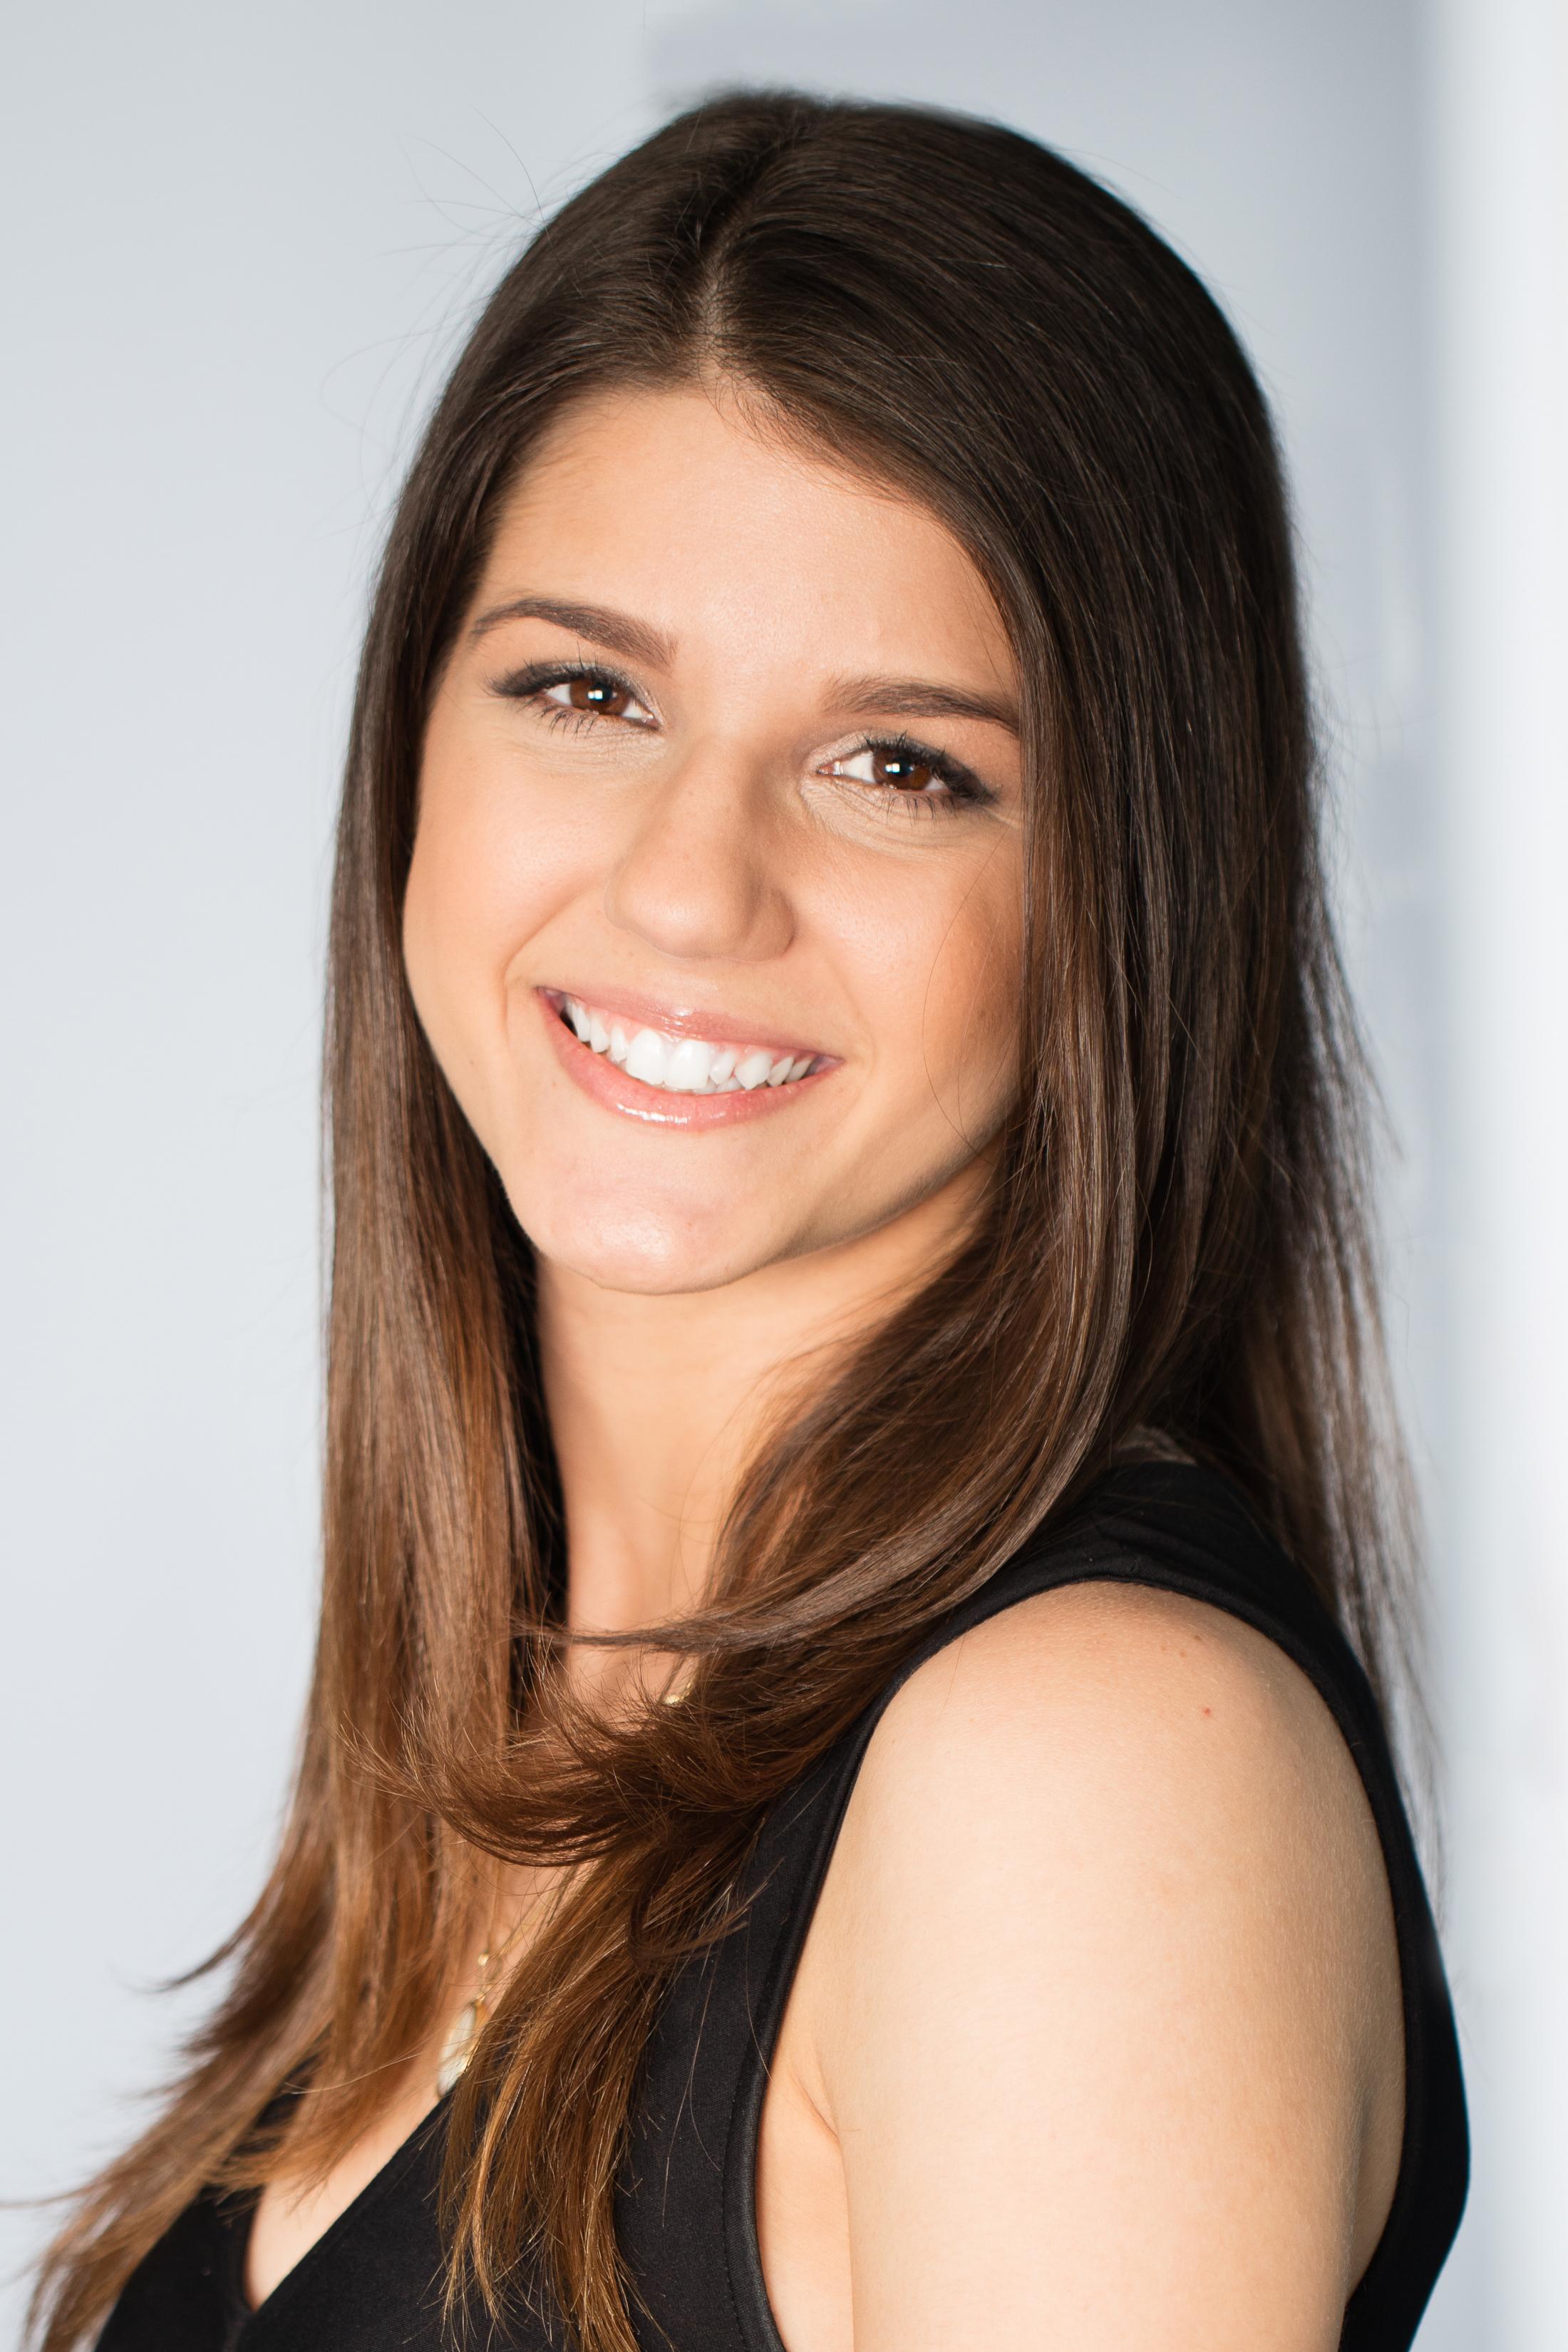 Rebecca Barrueco